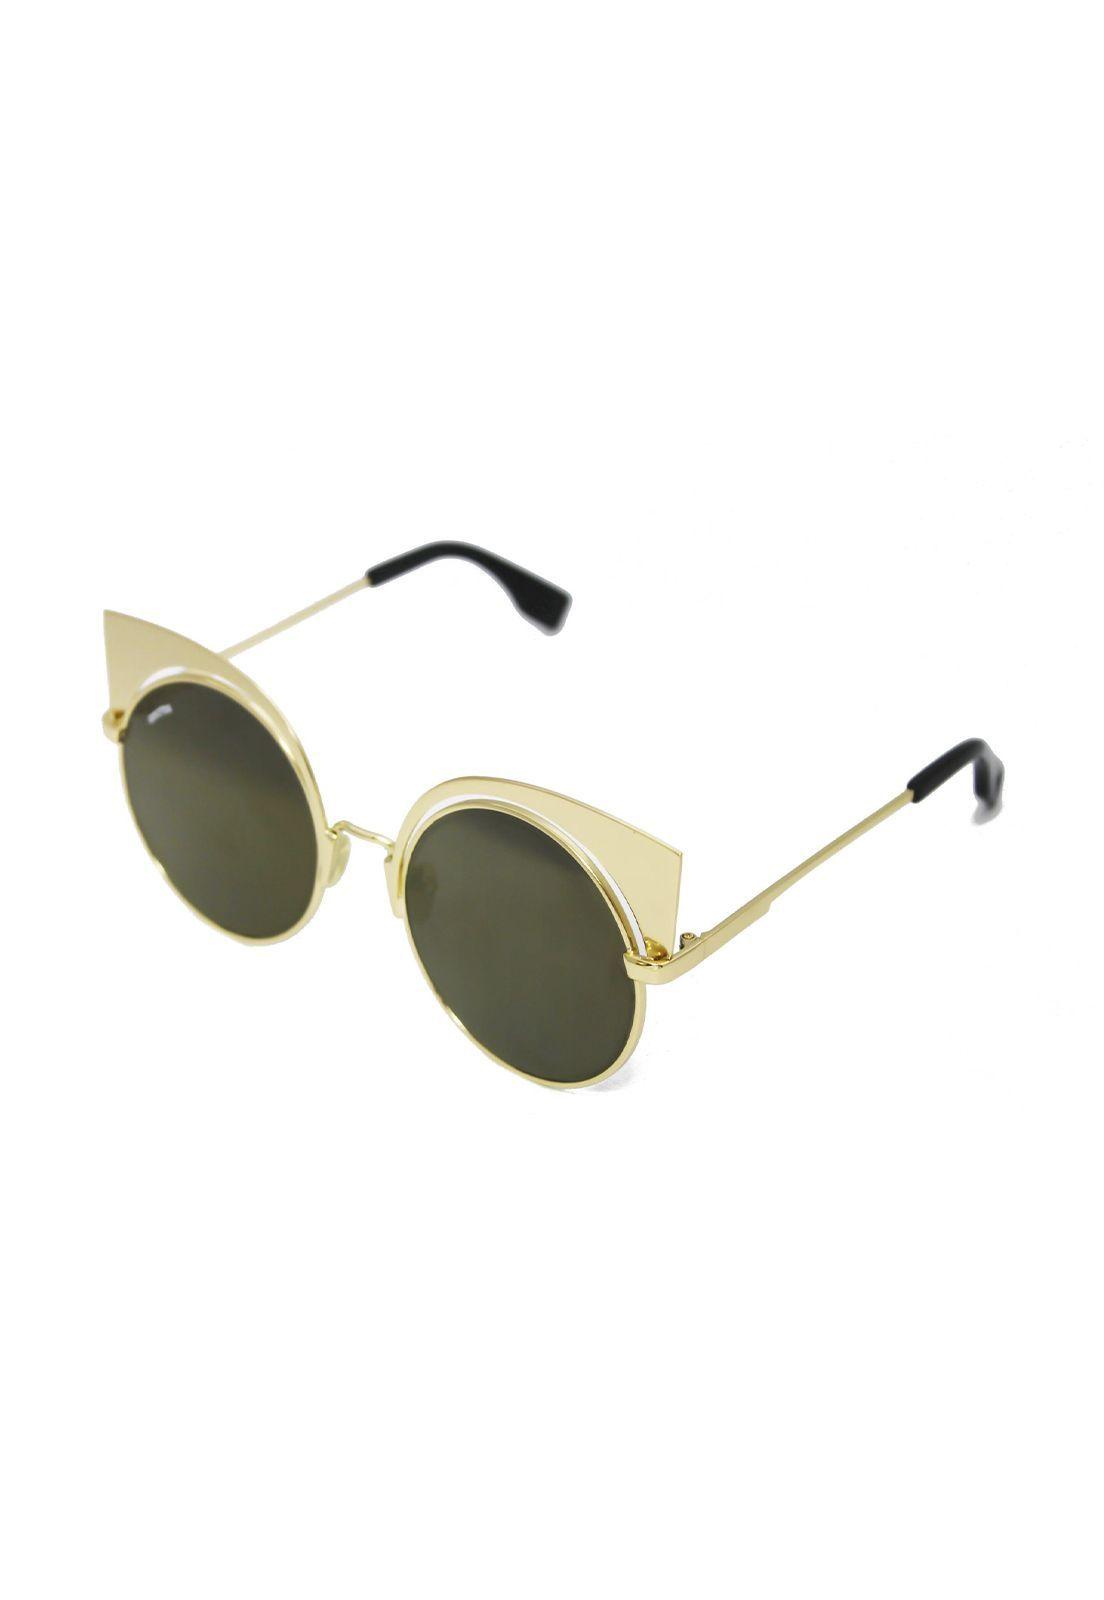 Óculos de Sol Grungetteria Cat Empire Dourado